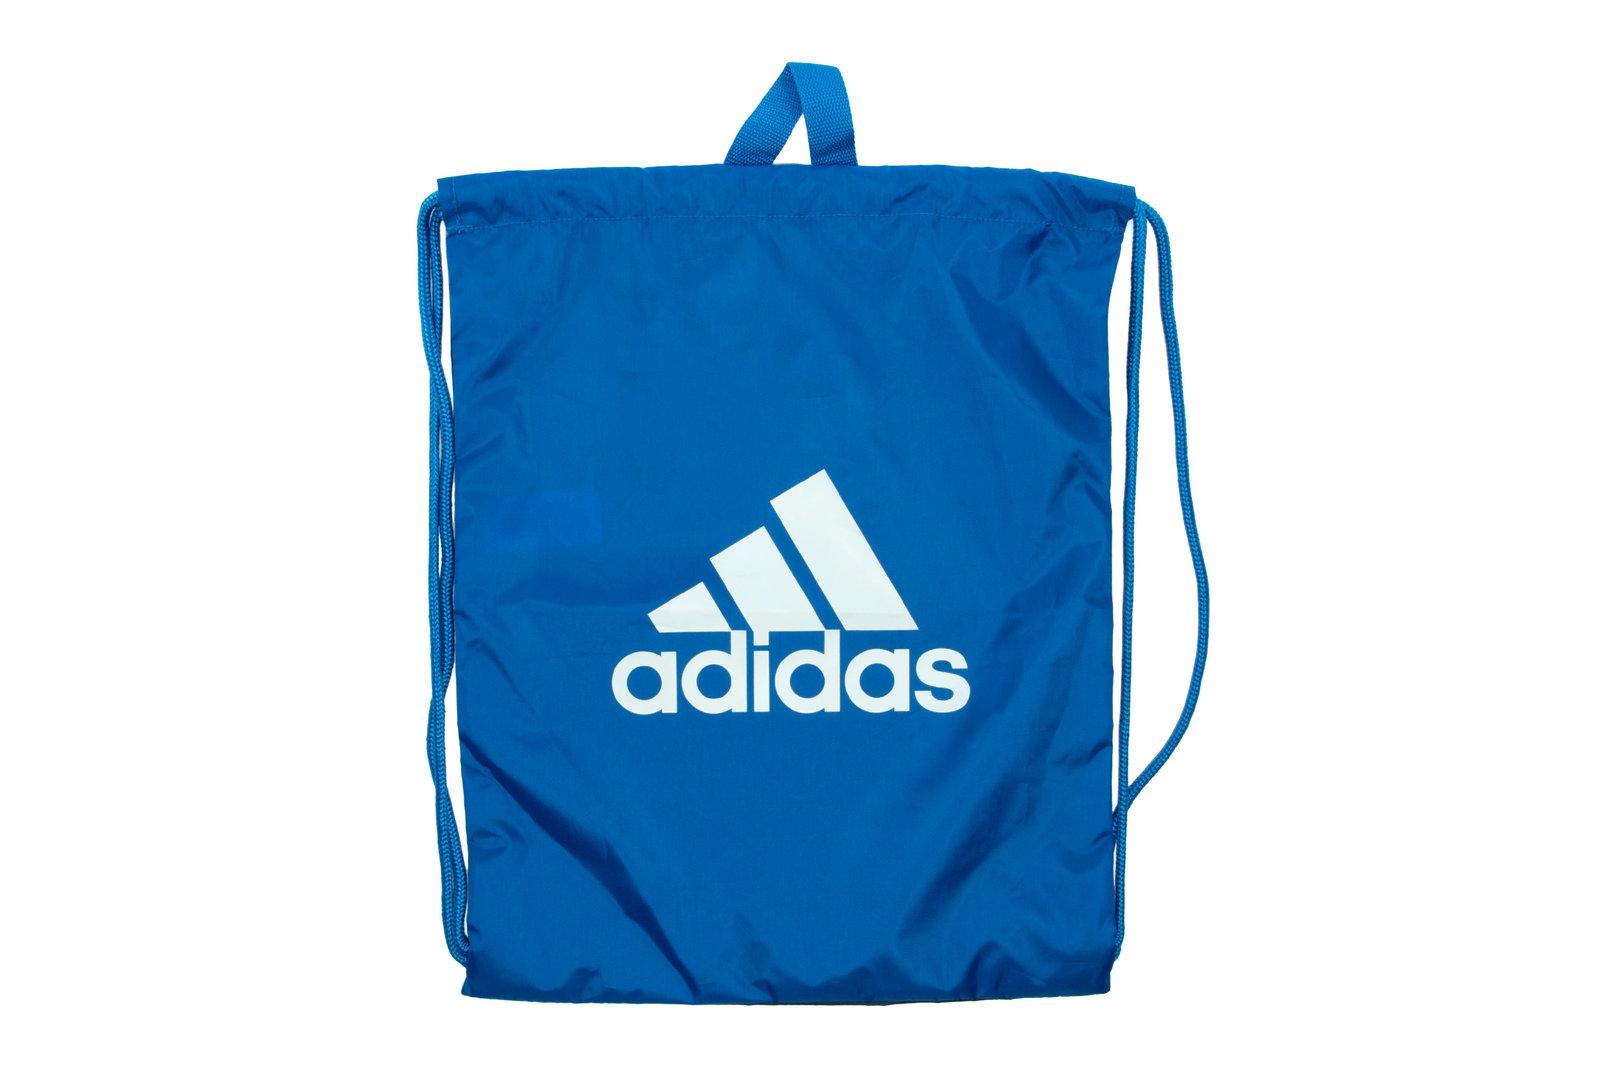 6ea5d2a77fc4 adidas Mens Tiro Gym Bag Duffel Bag Sports Fitness Trainings Blue